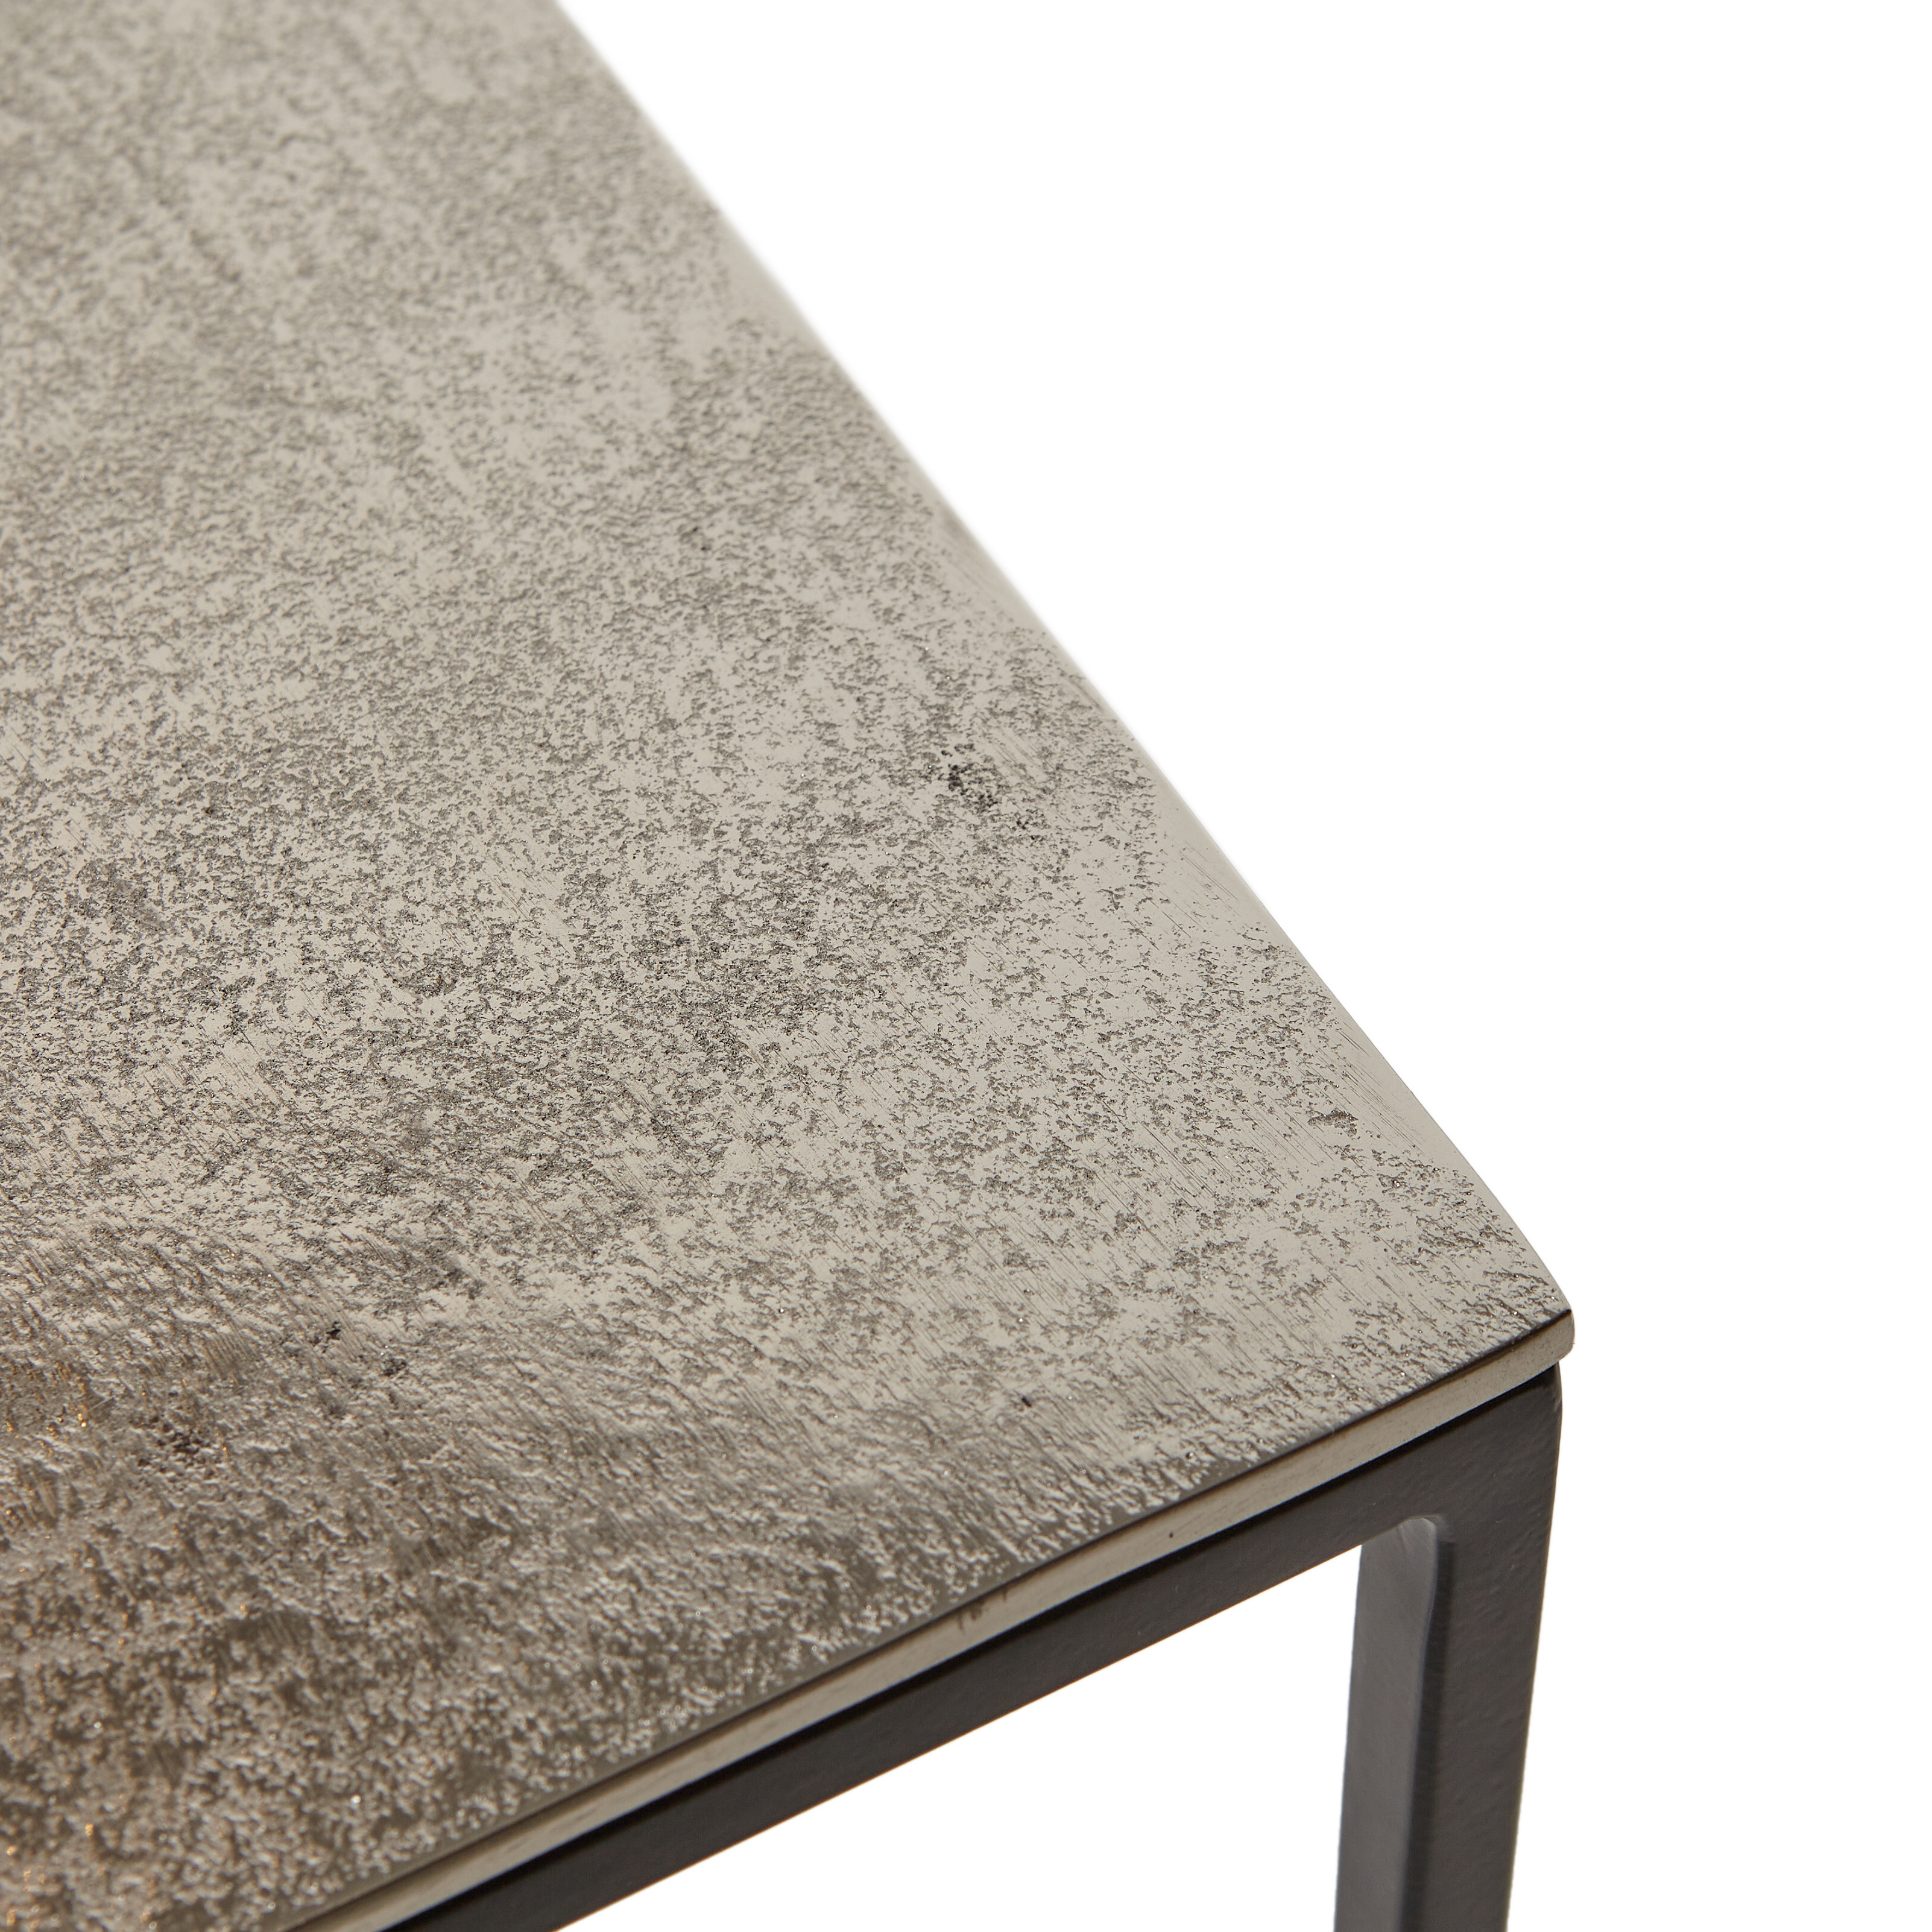 Consolle in alluminio e ferro Consuelo, Grigio argento, large image number 2